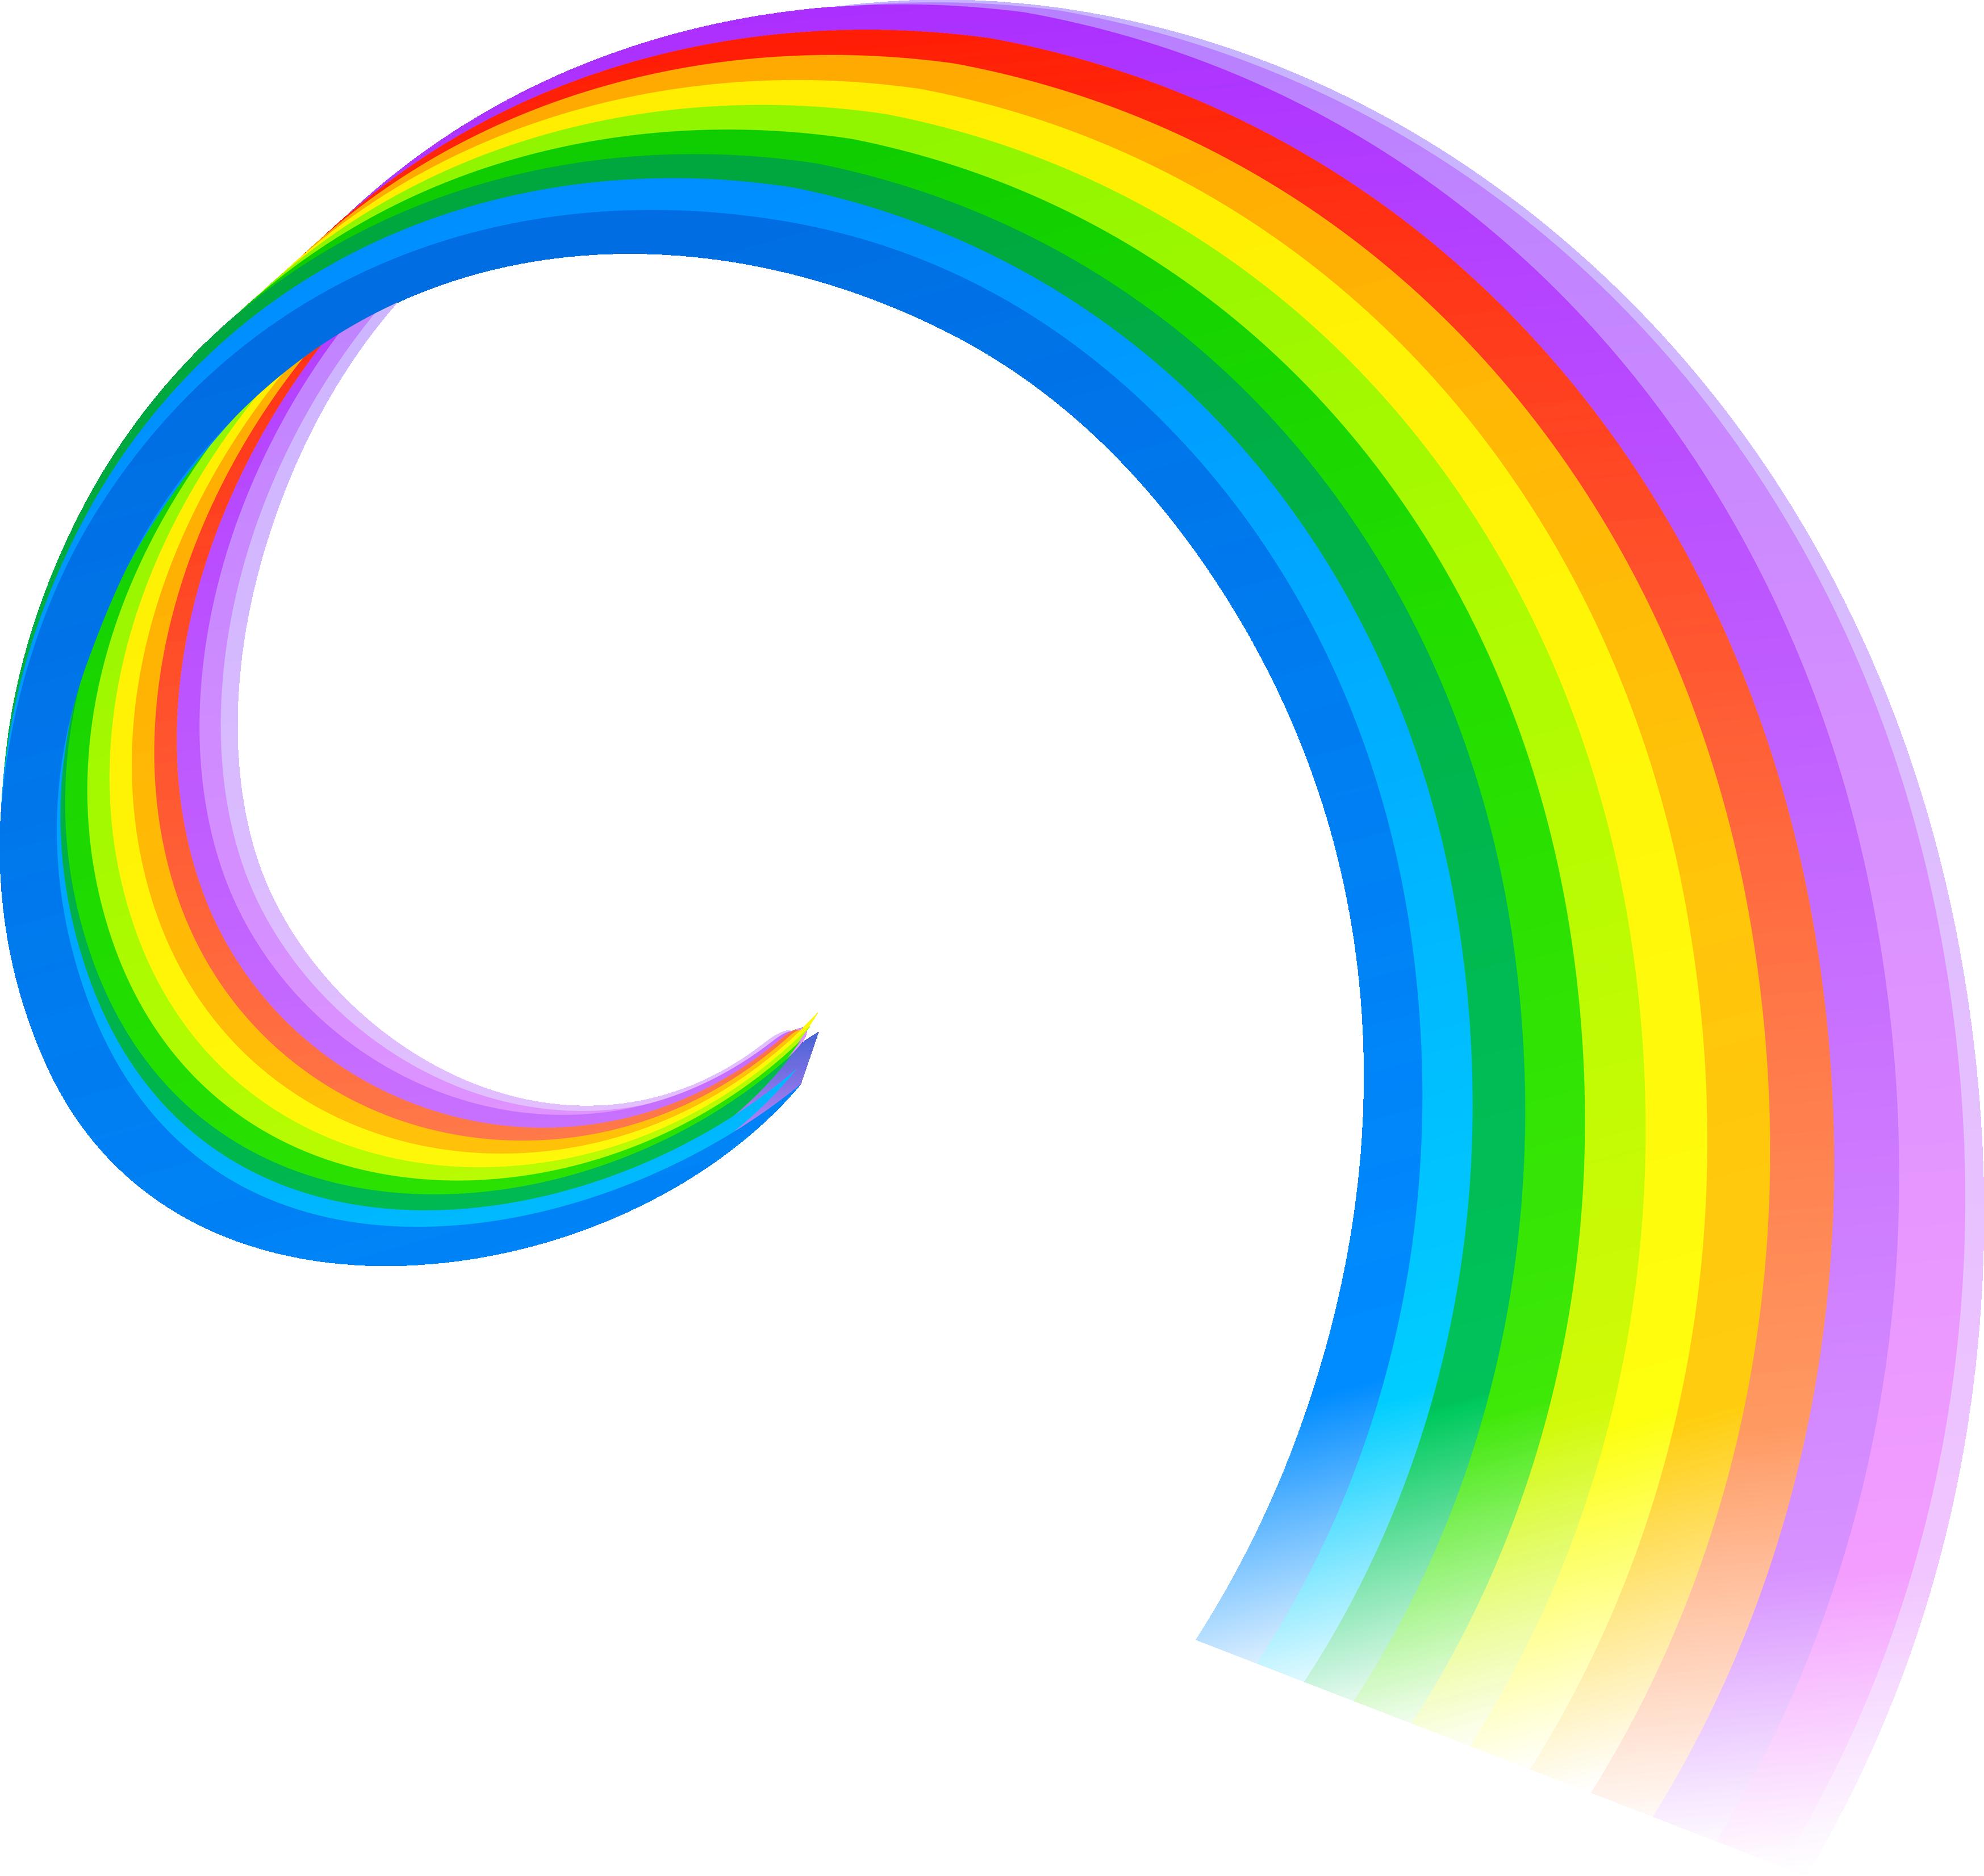 Rainbow and sun clipart background svg freeuse library клипарты рамки на прозрачном фоне - Google Търсене | rainbows ... svg freeuse library